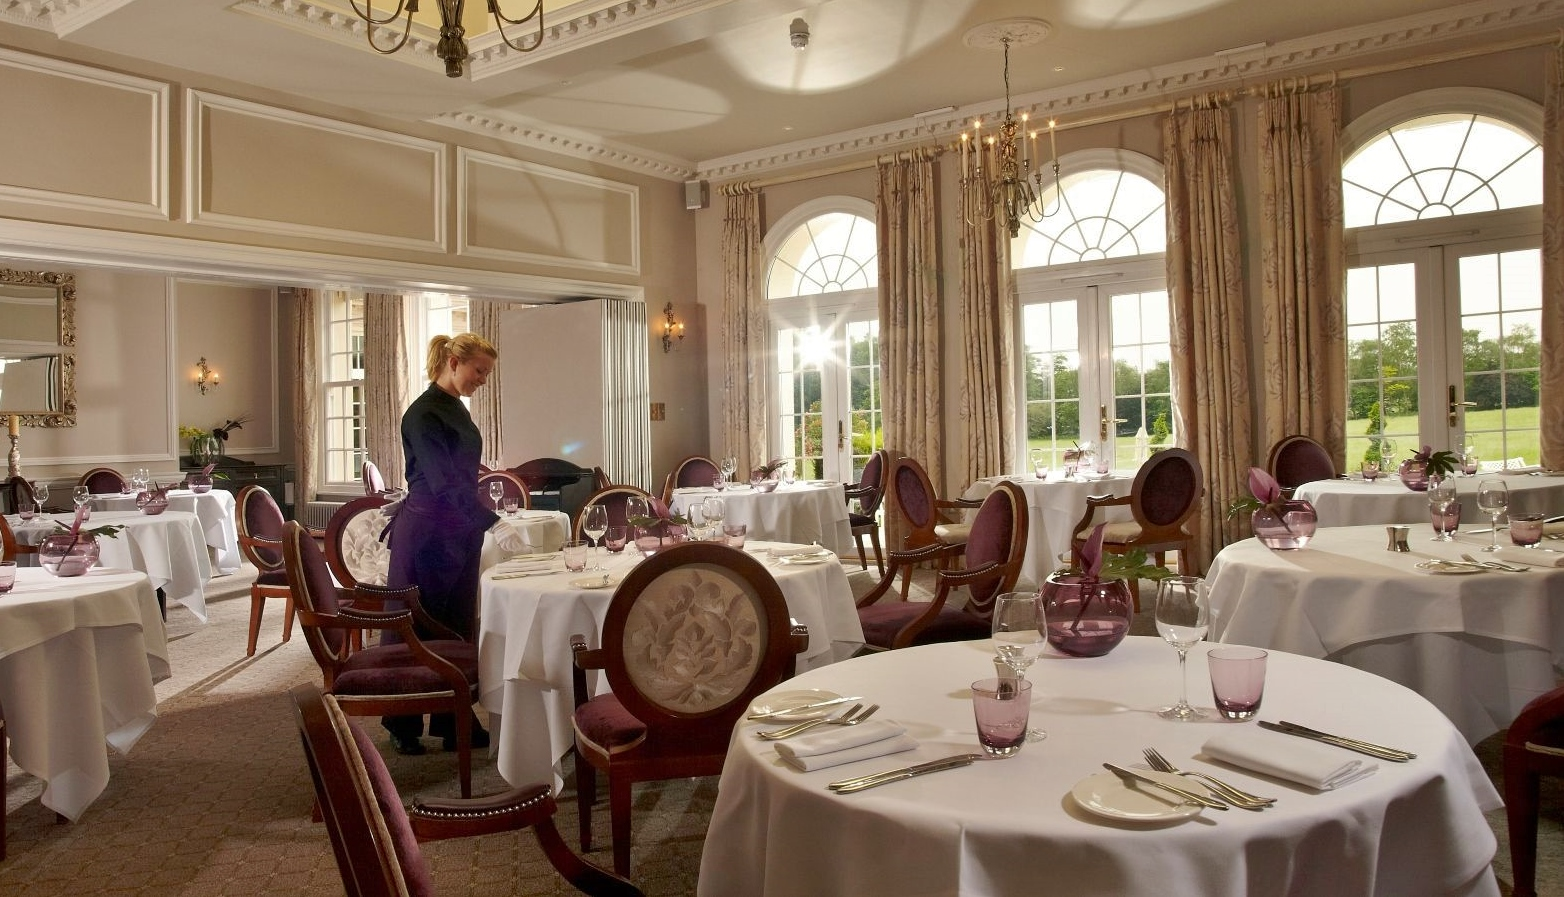 Eden Hotels-Brockencote Hall-12-06-12 10749 lr.jpg